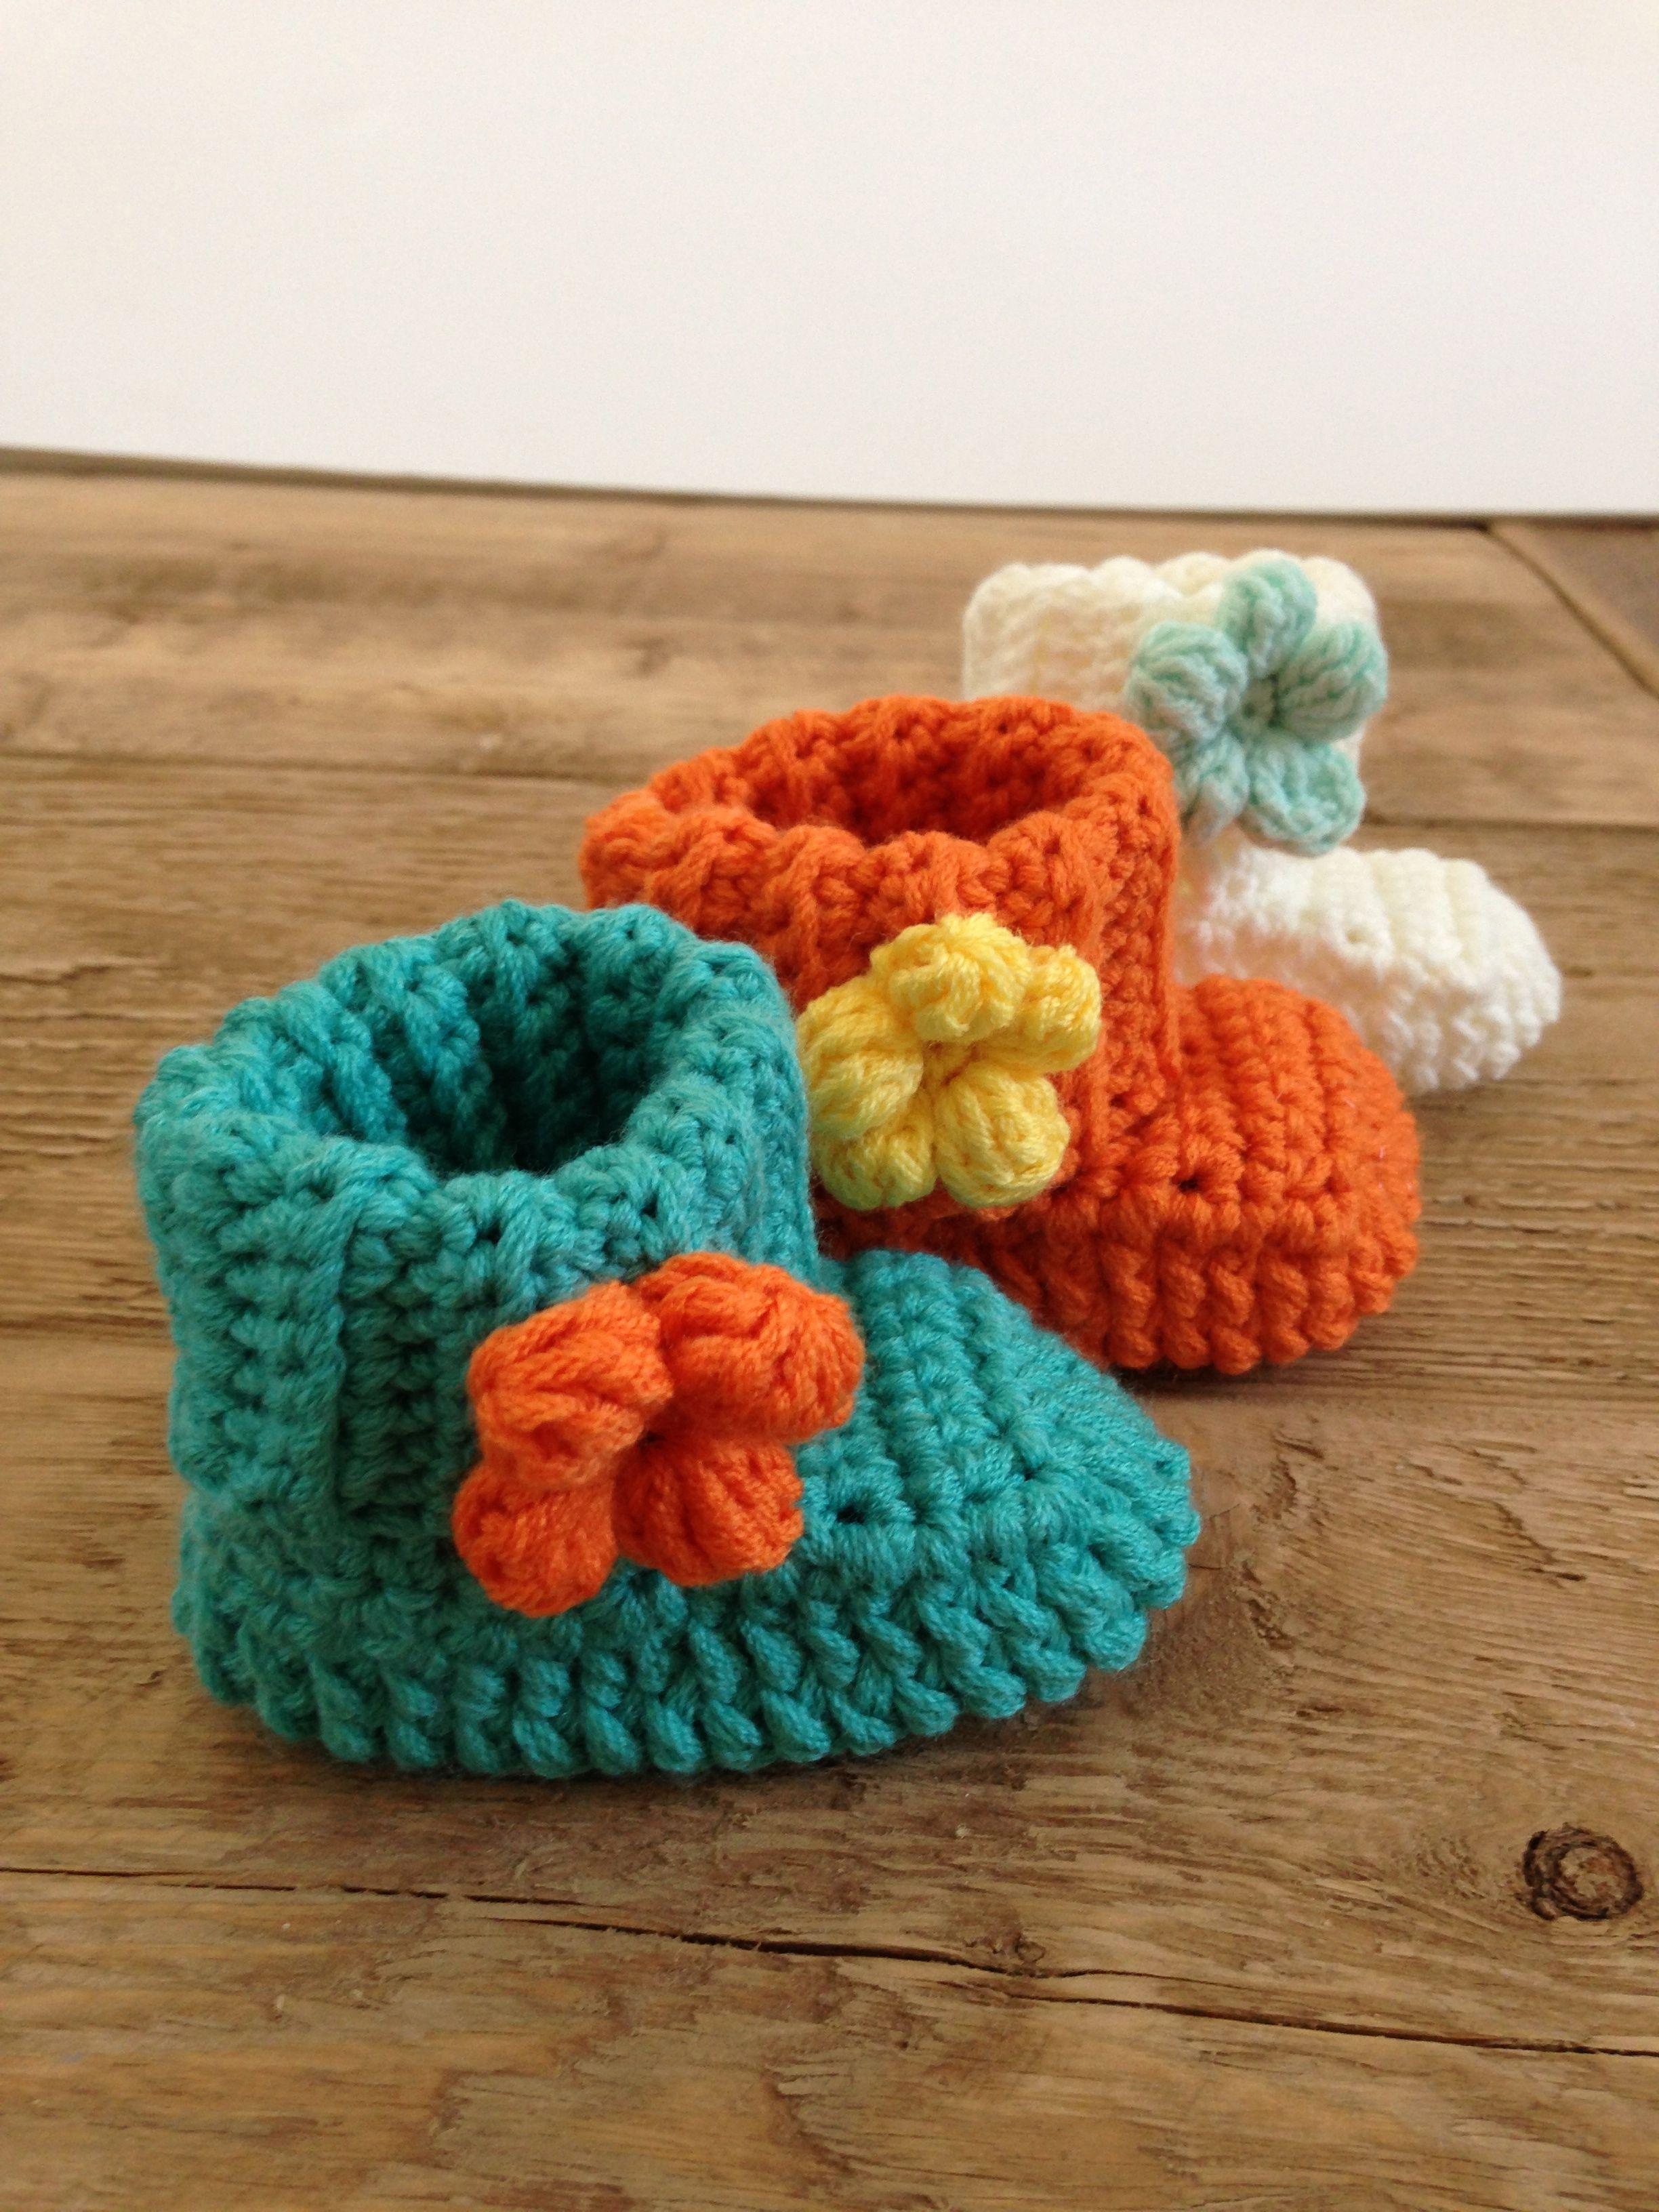 free pattern | DIY & Ideas Crochet | Pinterest | Babyschühchen ...